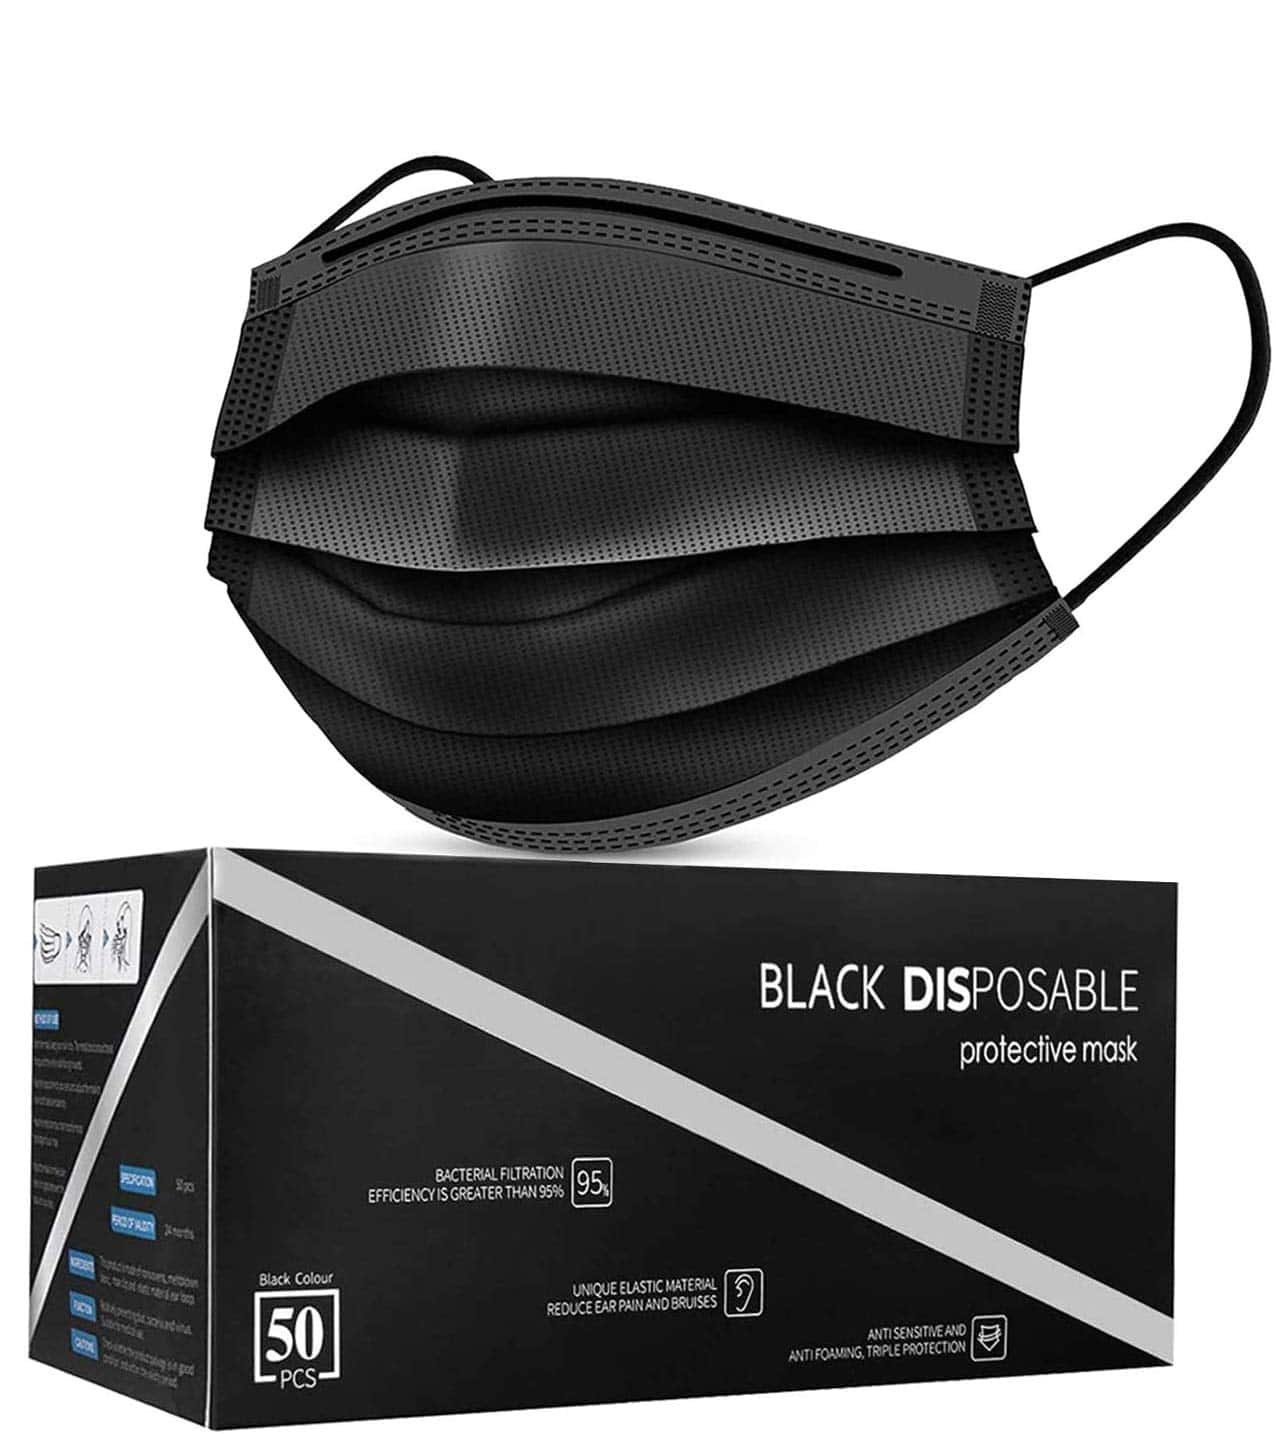 Amazon.com: Disposable Face Masks, Pack of 50 Black Face Masks: Industrial & Scientific $6.96